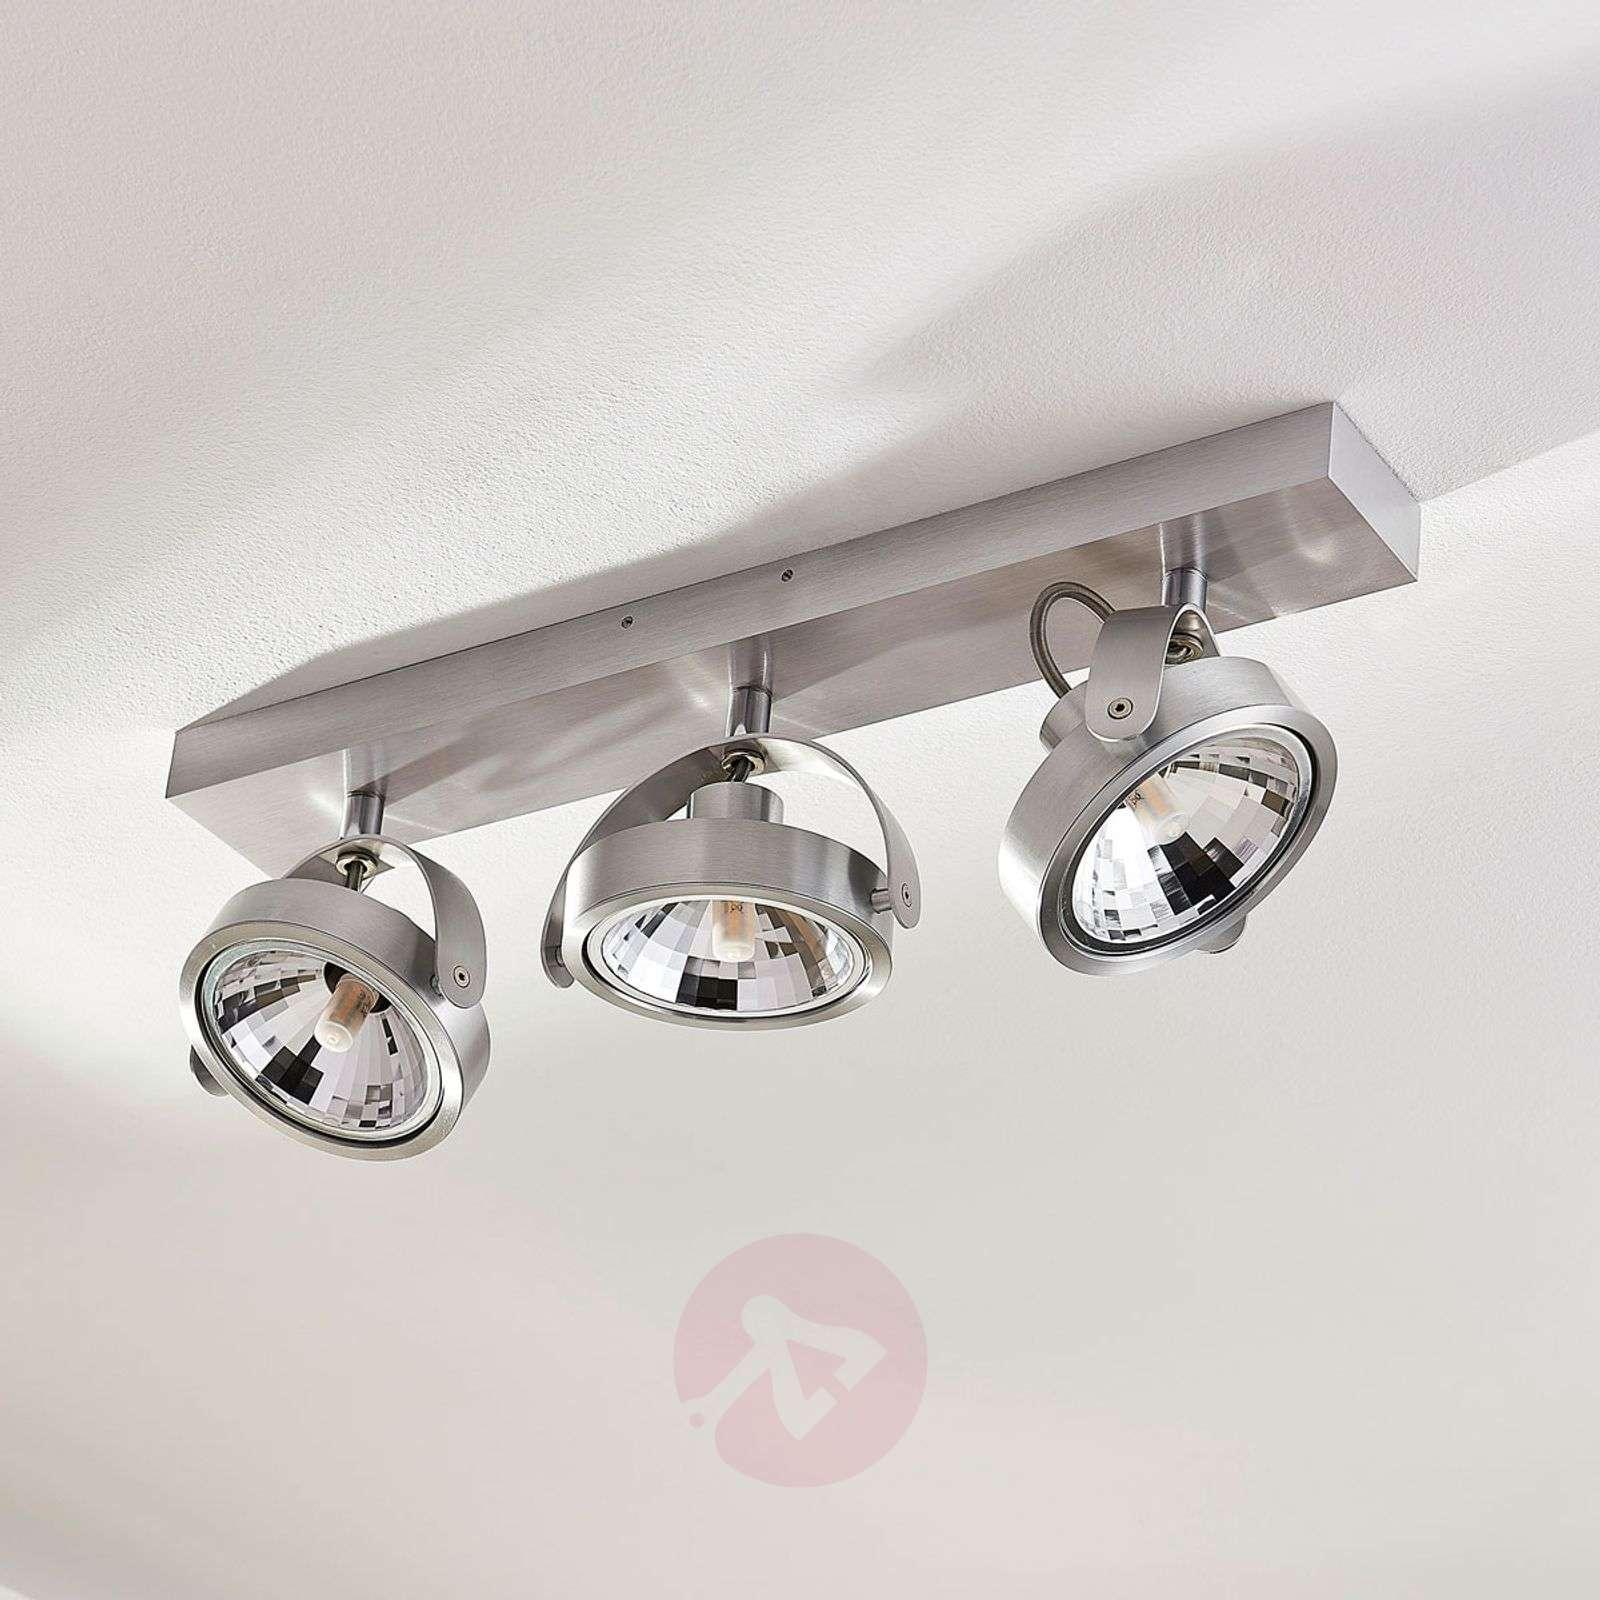 Lieven aluminium LED ceiling spotlight, three-bulb-9621522-01